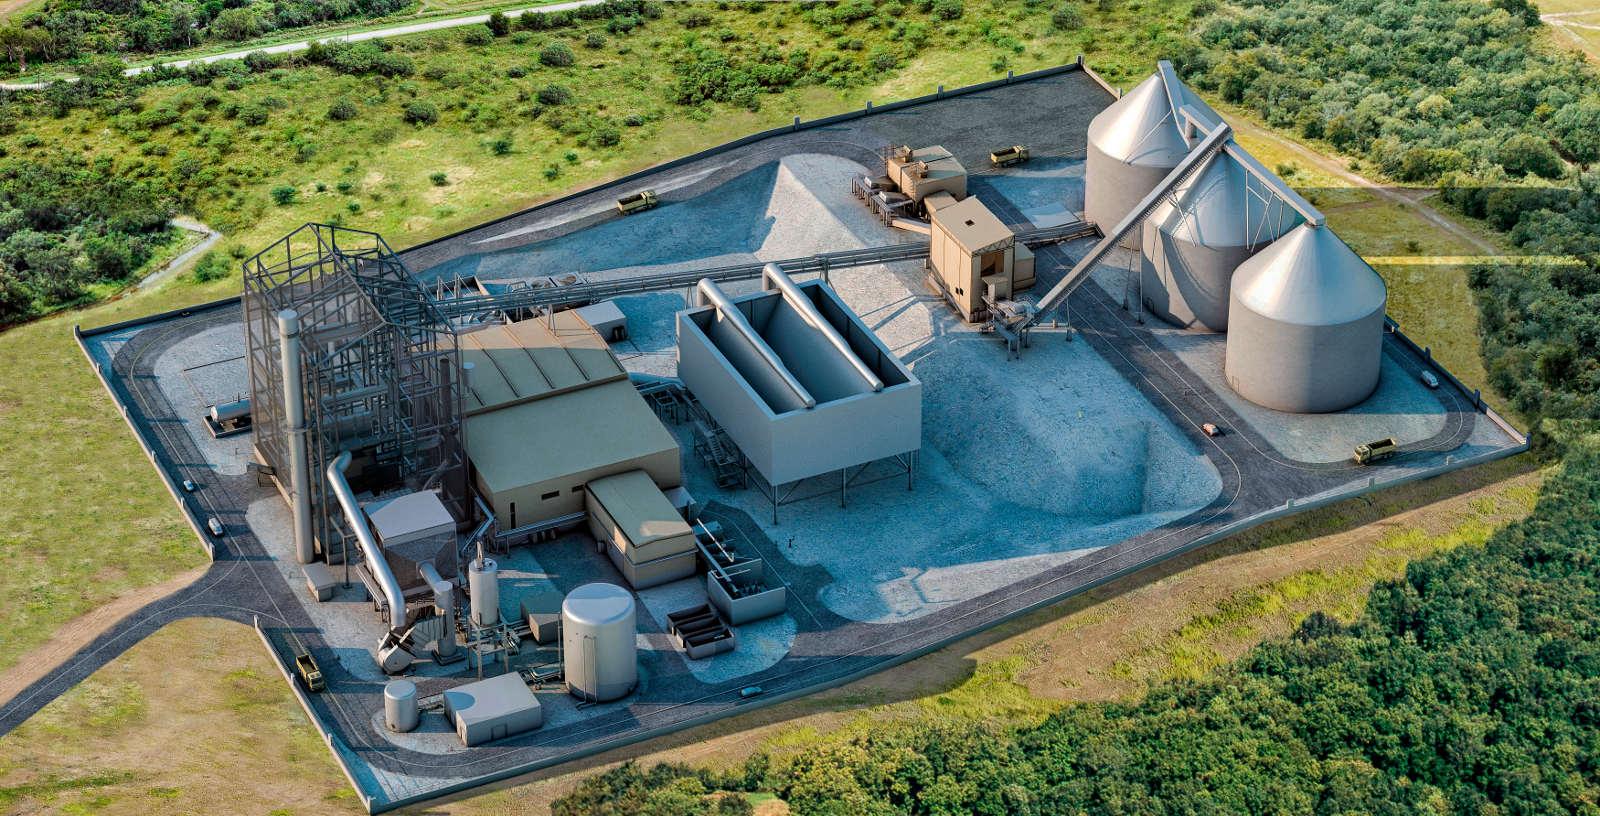 IBERDROLA_Detail_Engineering_Biomass_Canada_01_Idom